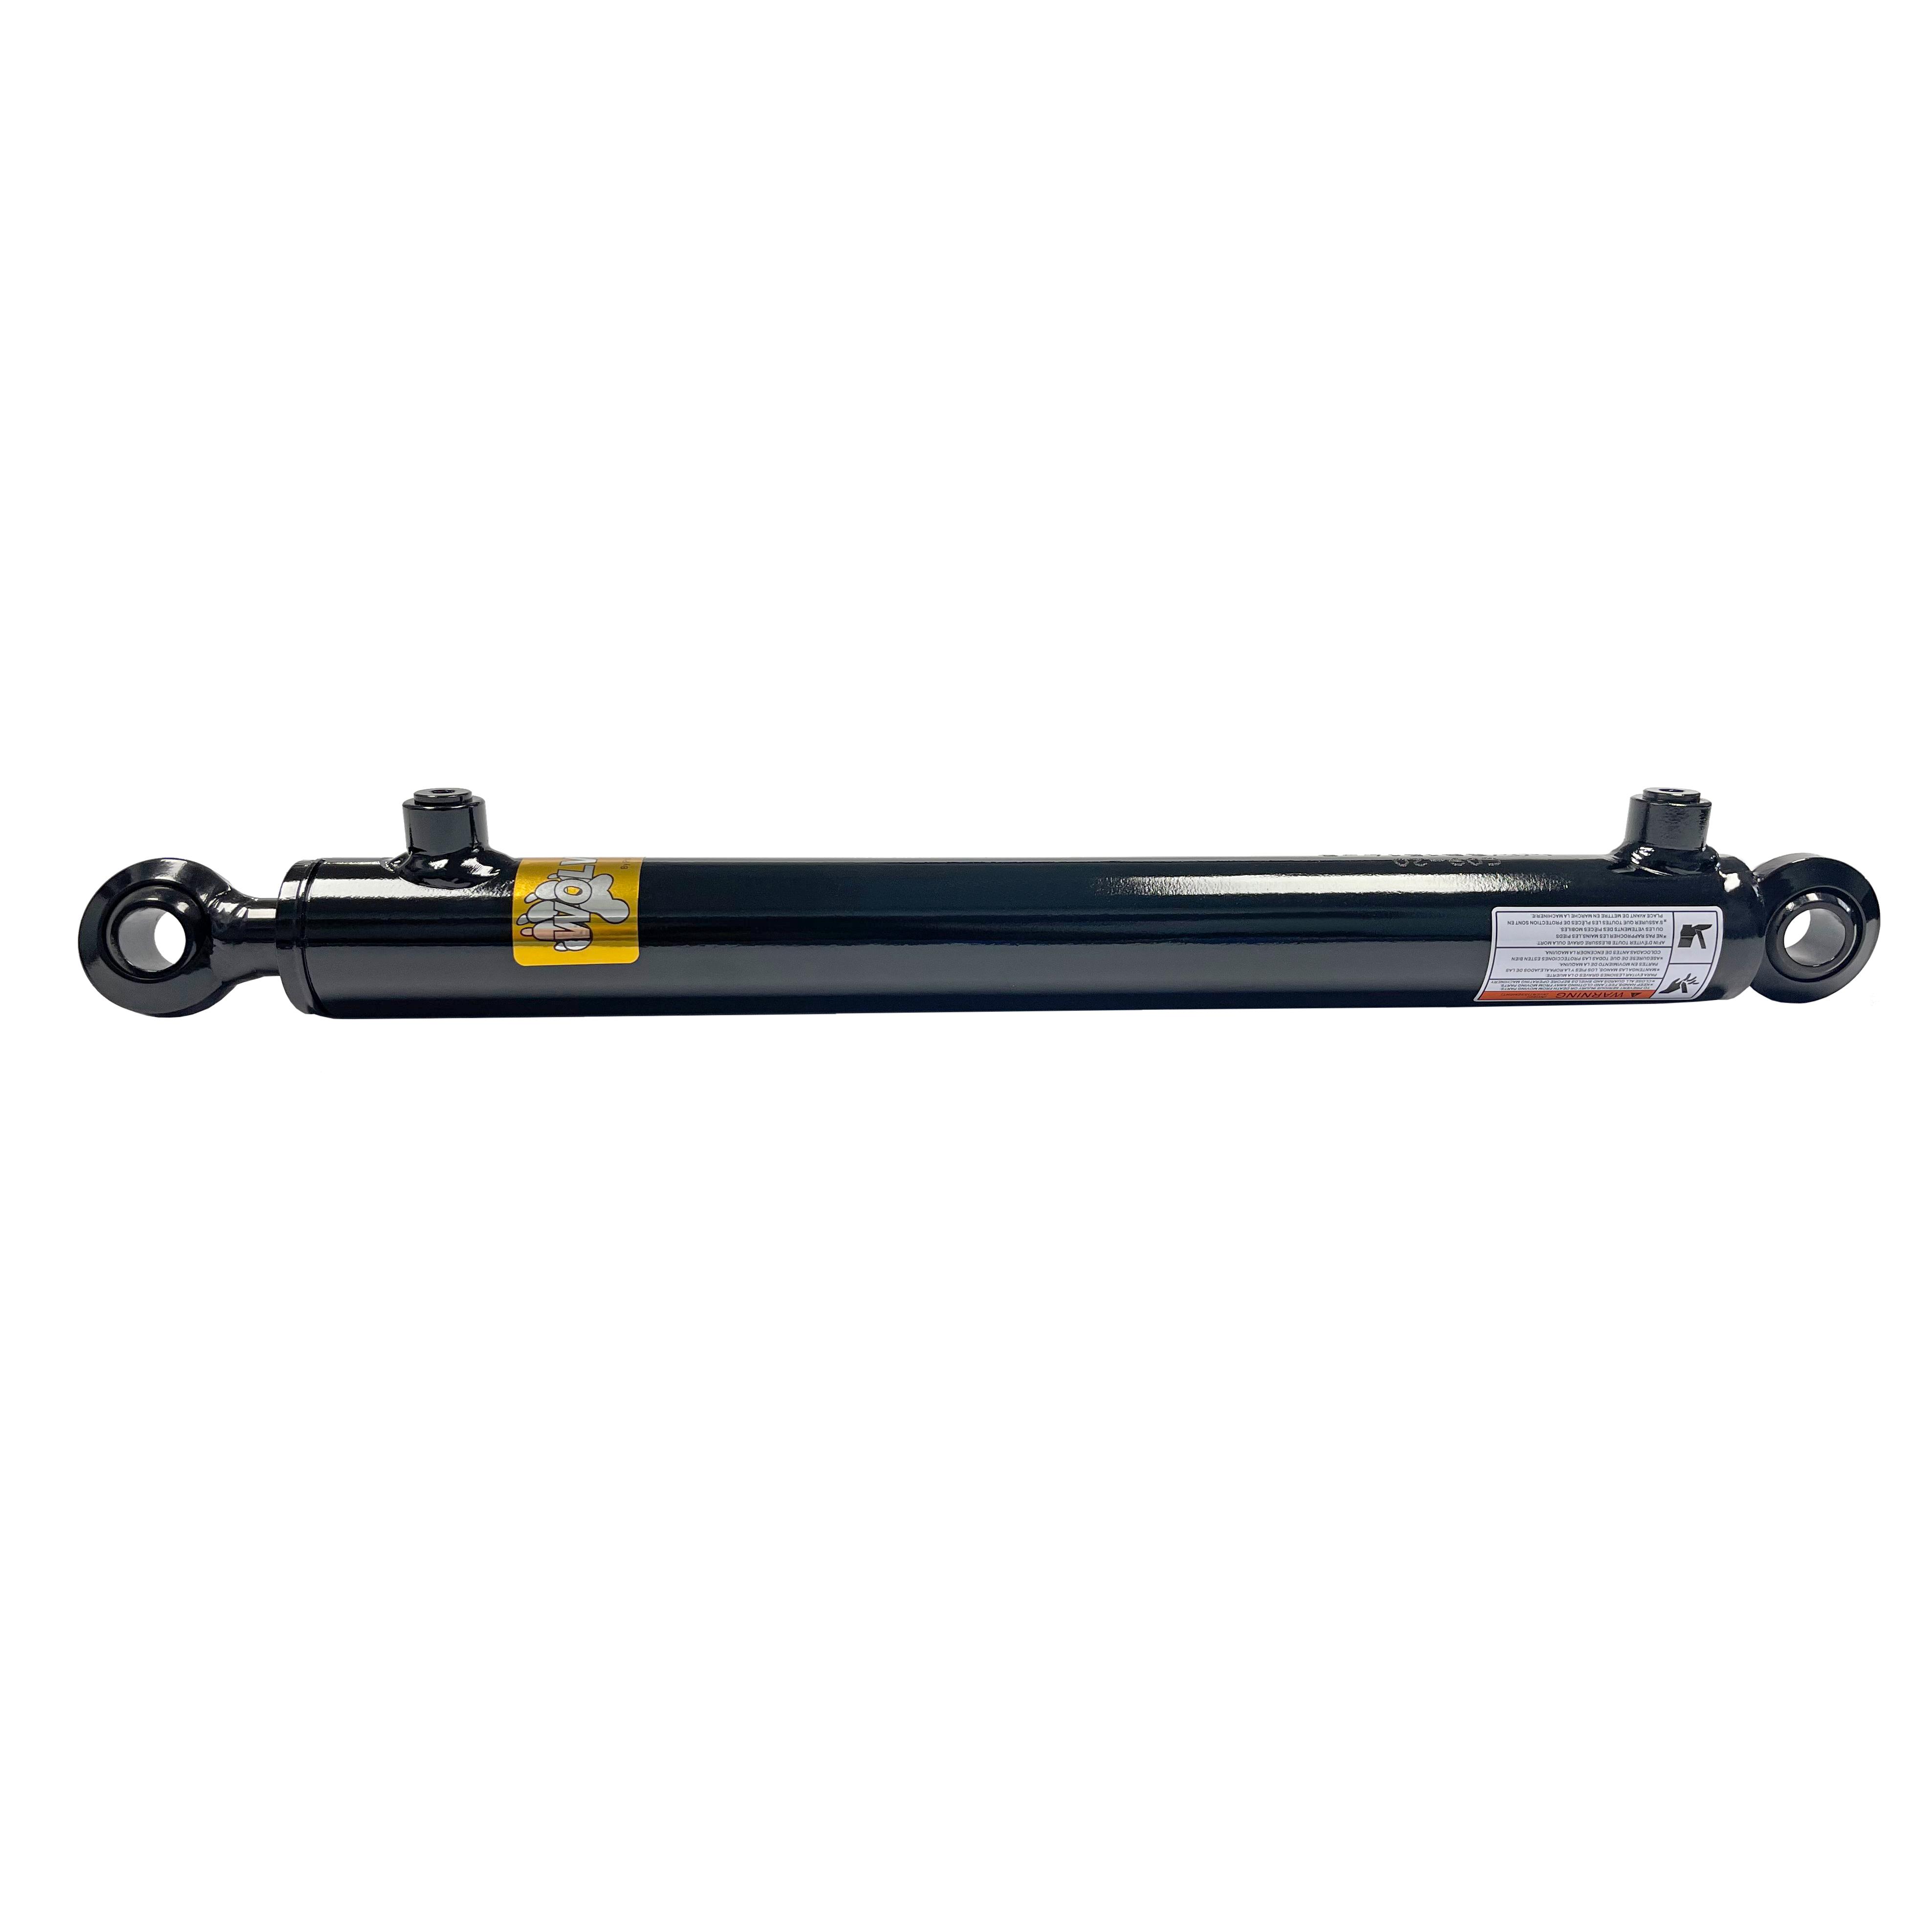 1.5 bore x 12 stroke swivel eye hydraulic cylinder, welded swivel eye double acting cylinder | Prince Hydraulics